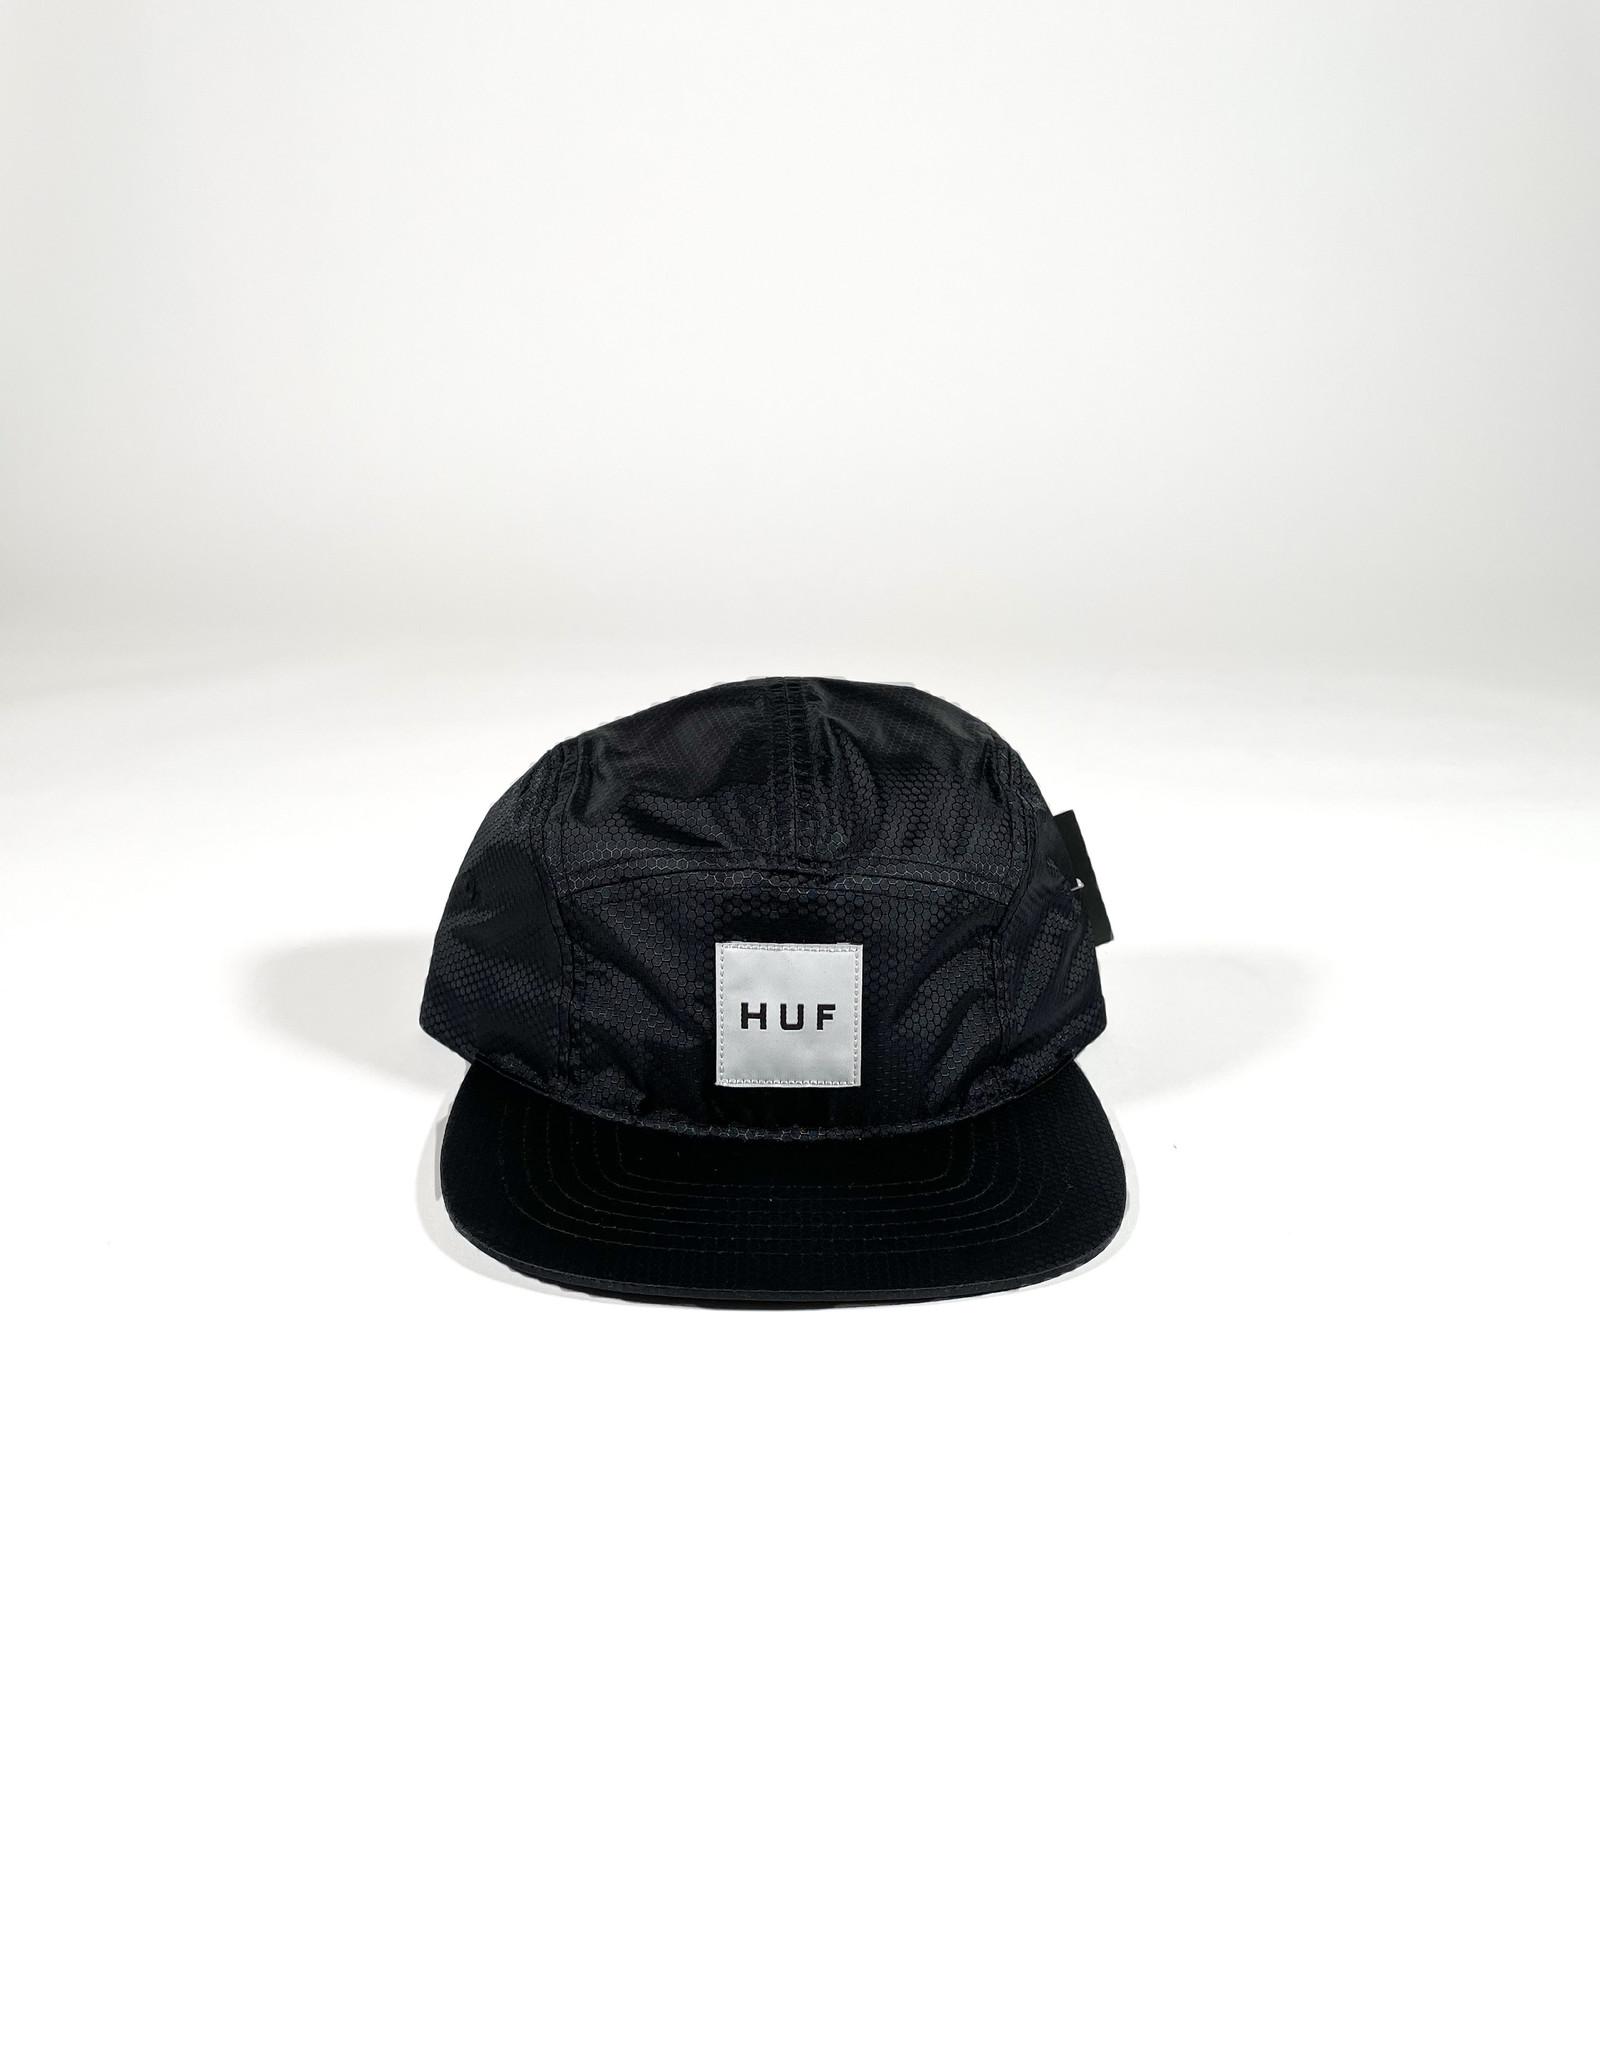 HUF HEXAGON VOLLEY - BLACK